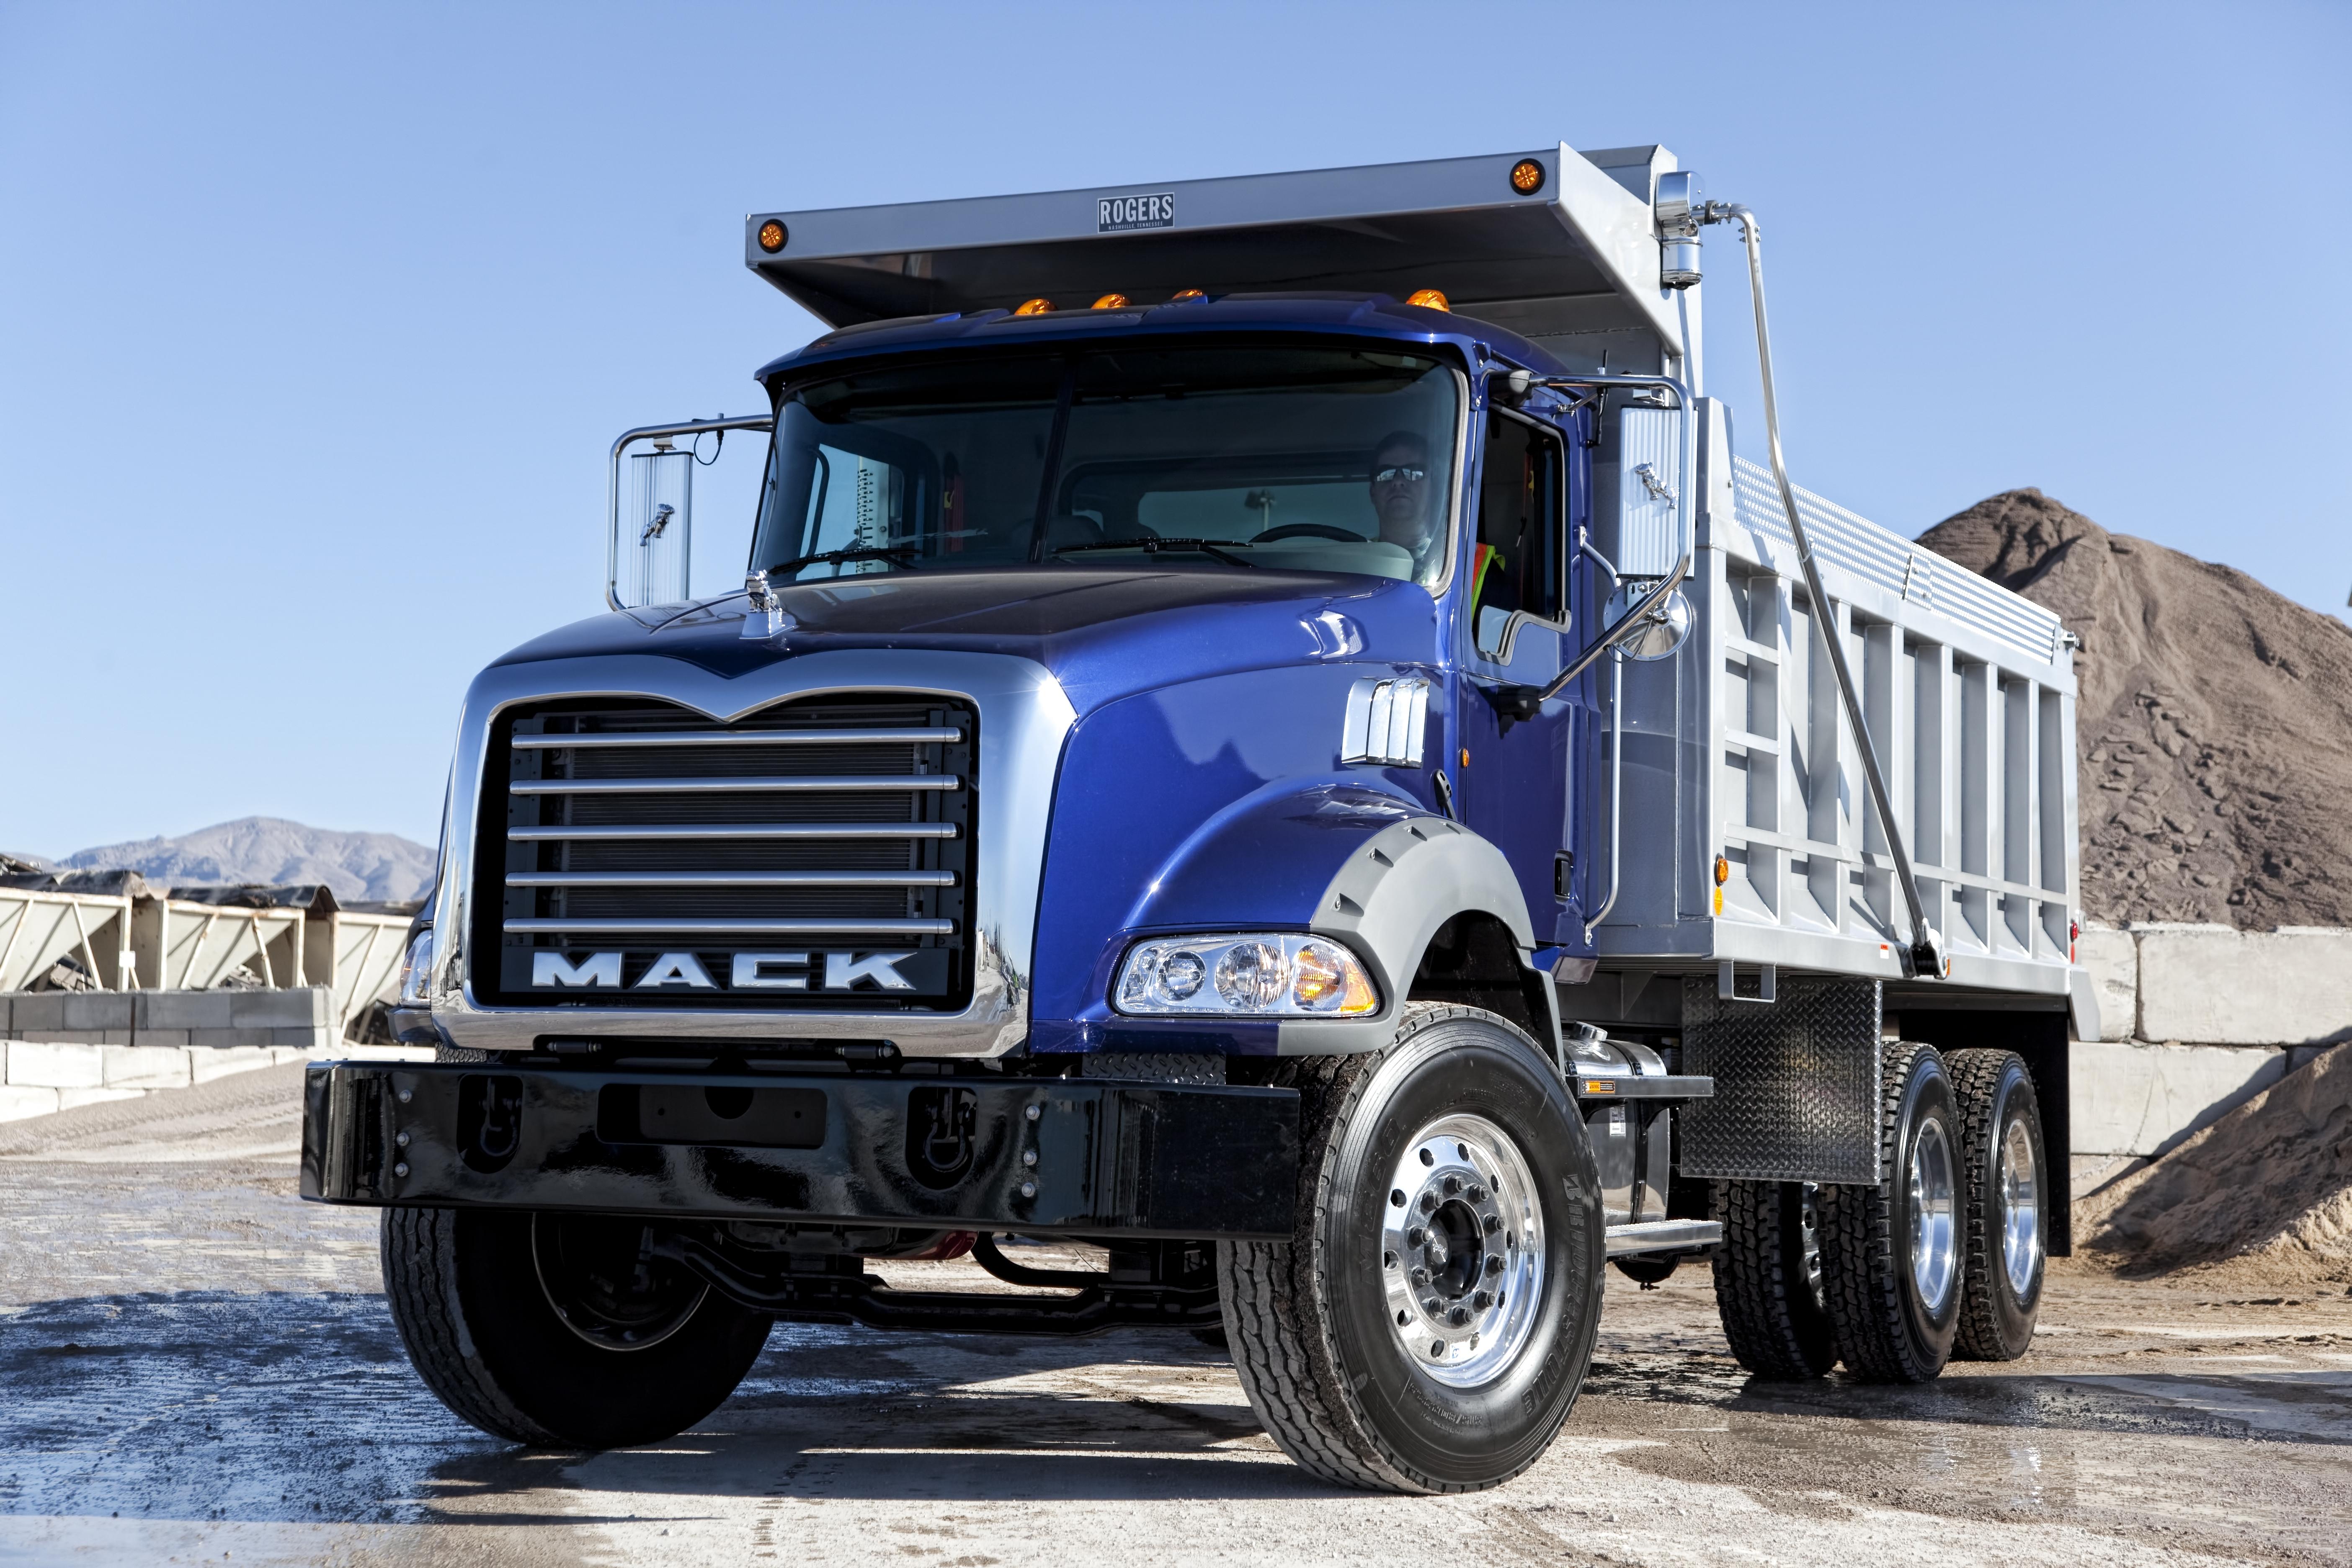 2003 Mack Truck Wiring Diagram - Wiring Diagram G11 Mack Truck Wiring Diagram on 2006 international 4300 truck wiring diagram, 2001 dodge truck wiring diagram, mack fuse box diagram, eaton fuller transmission parts diagram,